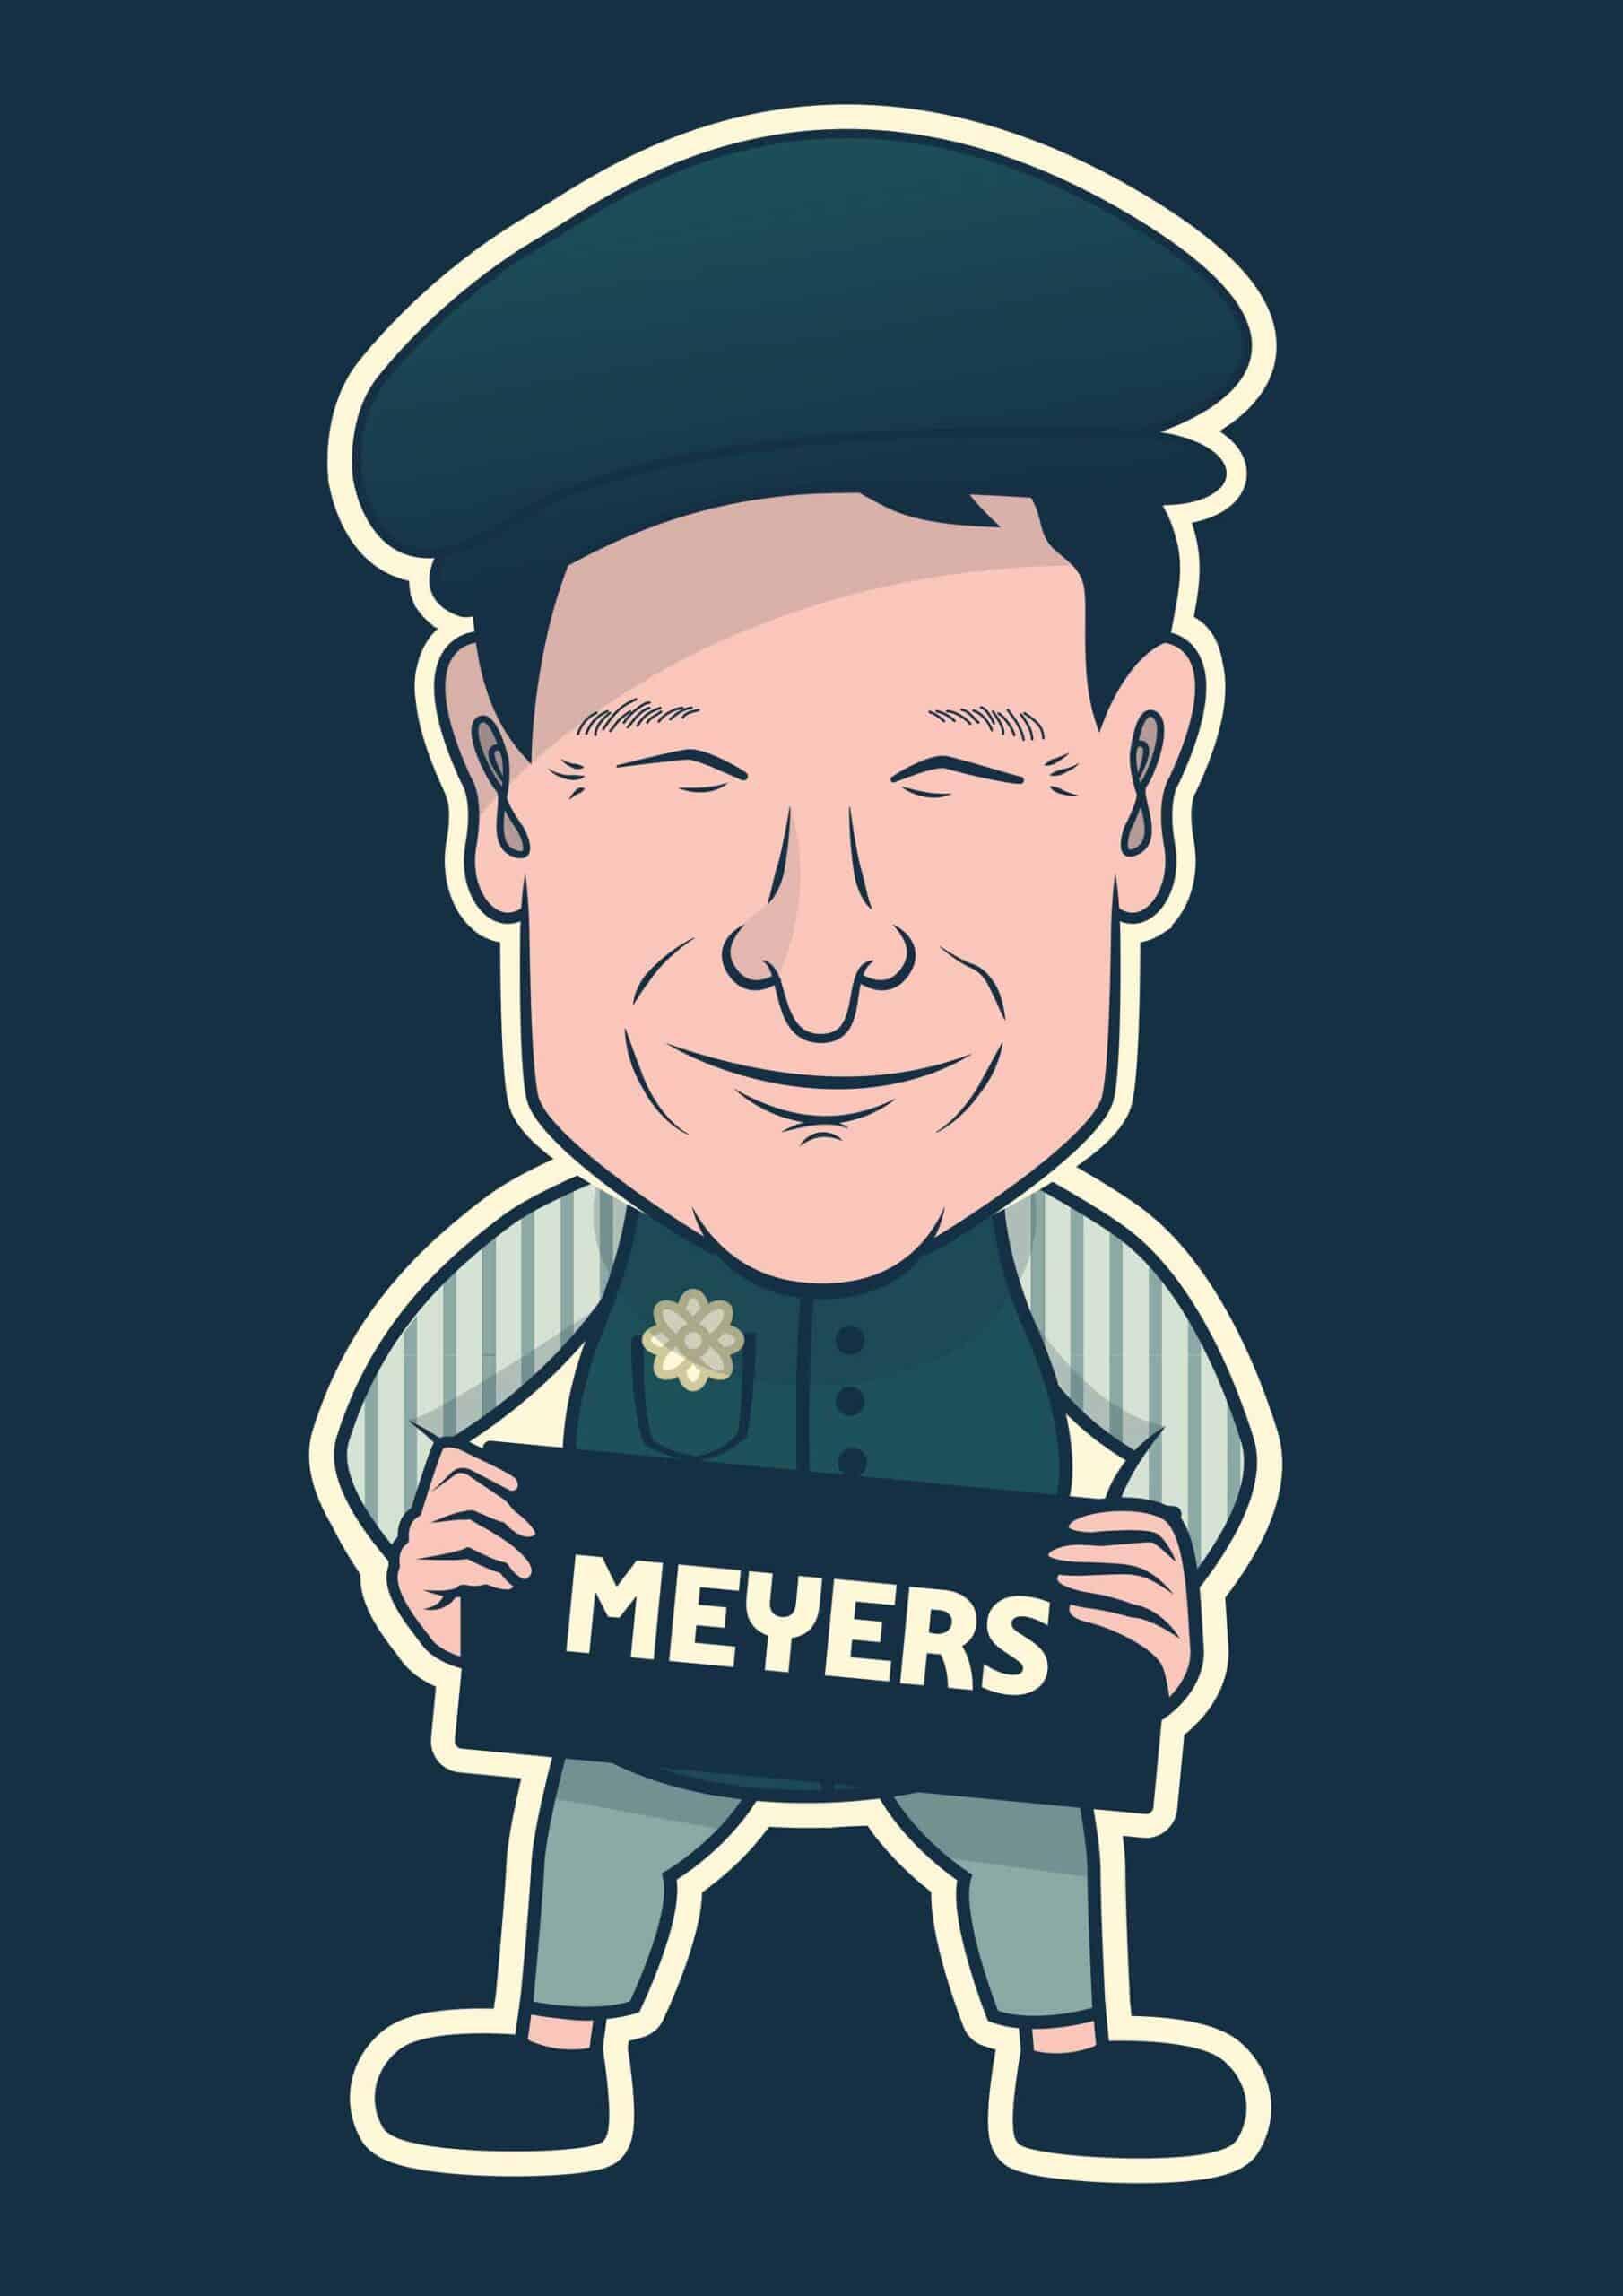 Meyers karikatur til illustrerede facadeskilte på Roskilde Festival